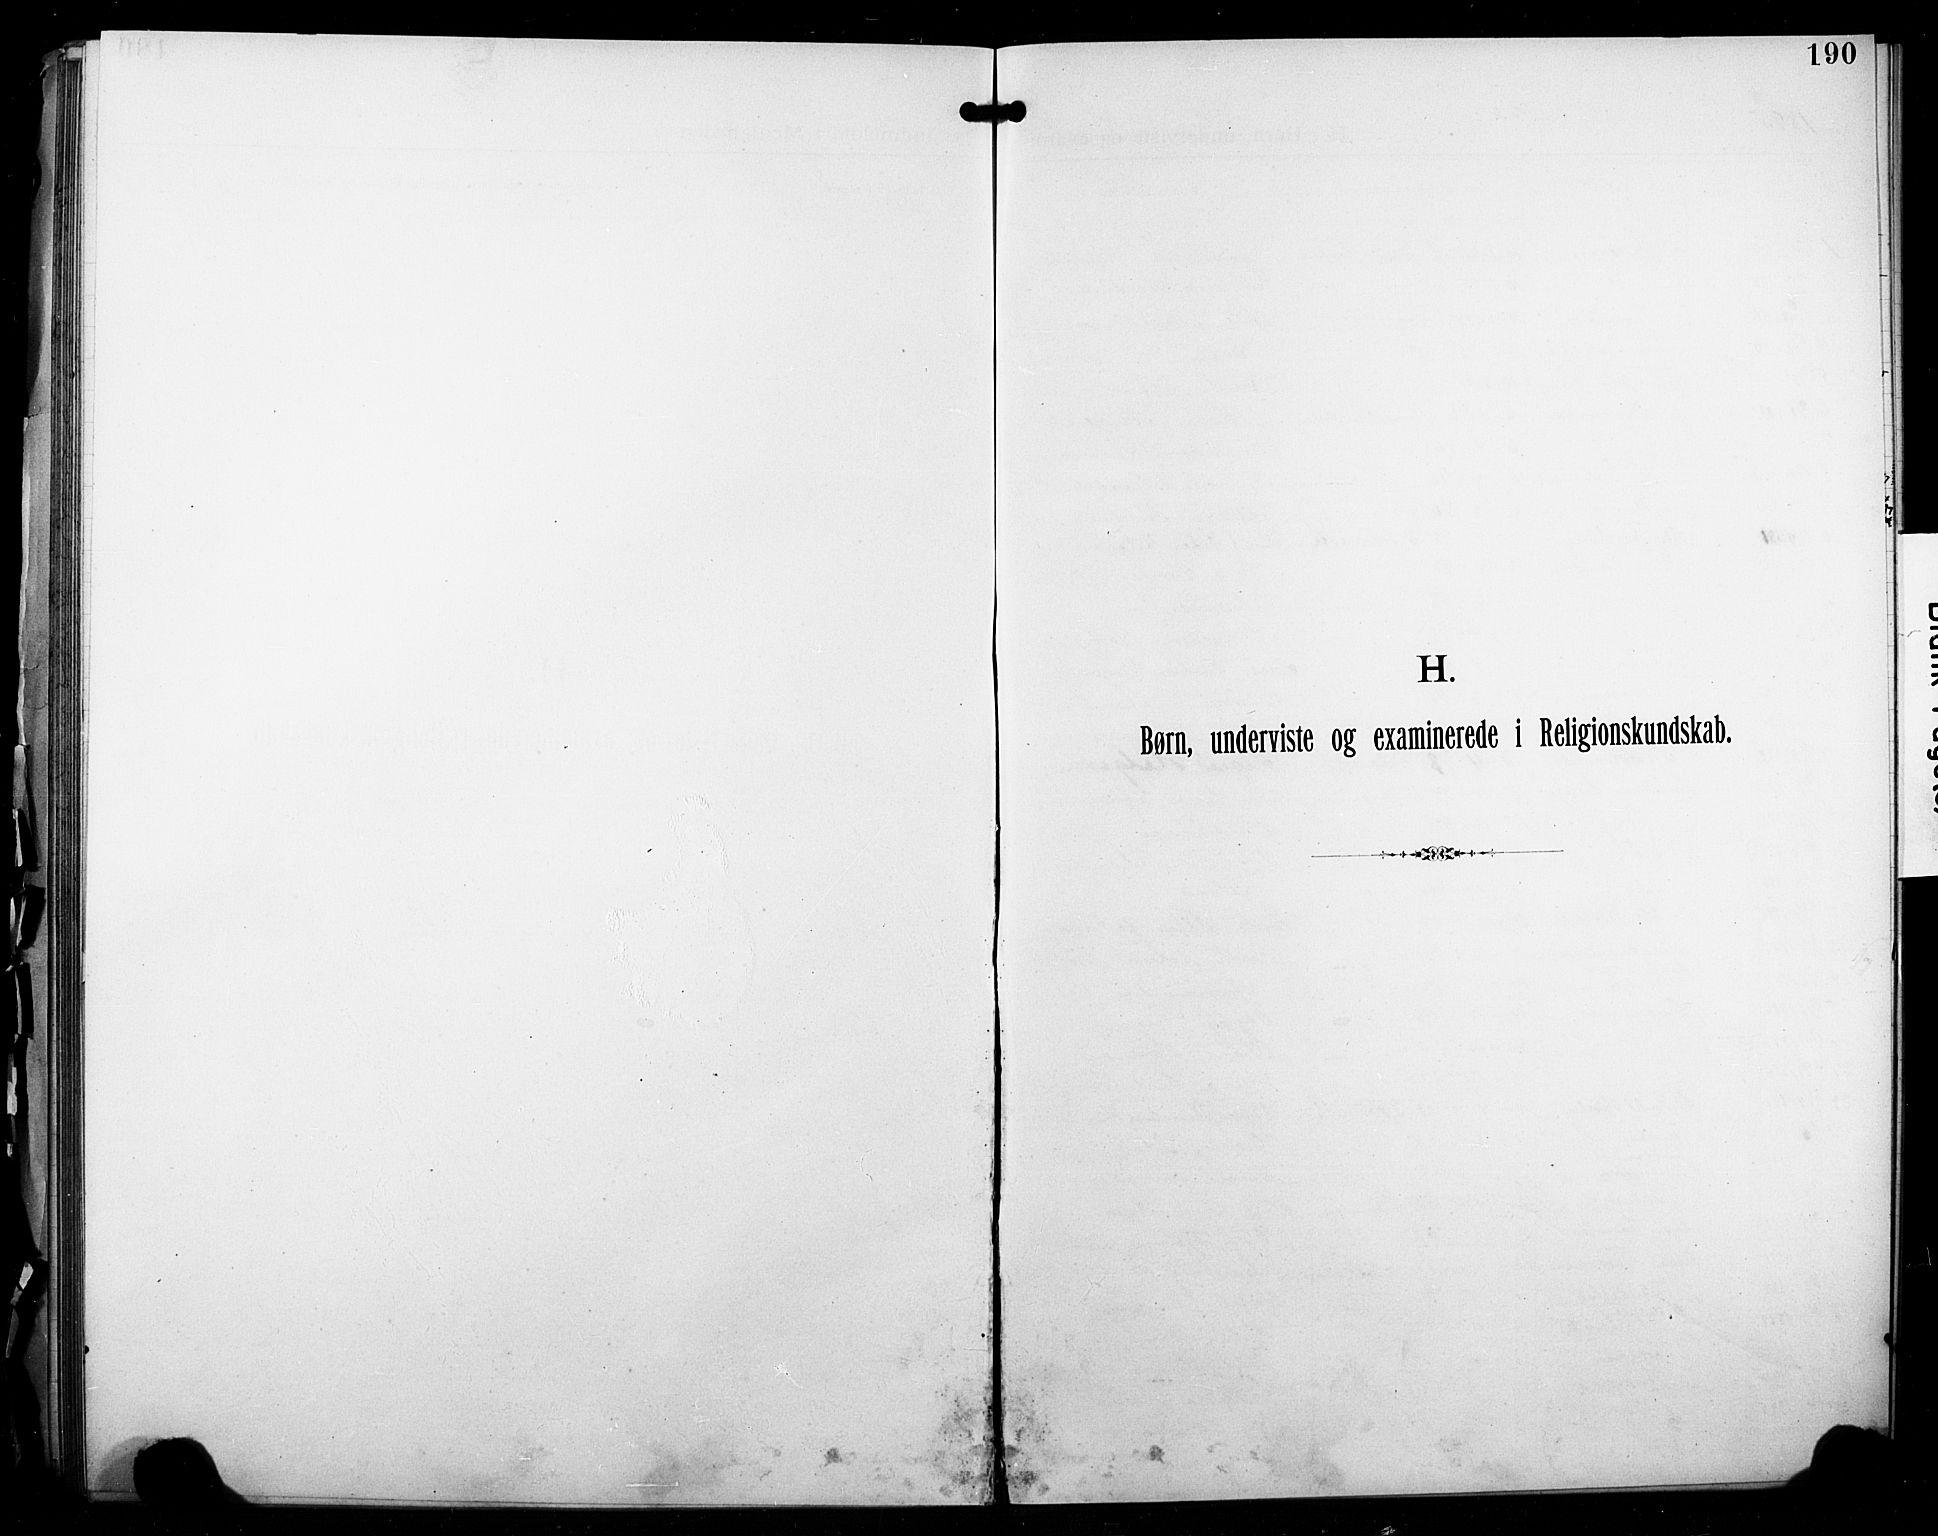 SAO, Kristi menighet Fredrikstad , A/L0001: Dissenterprotokoll nr. 1, 1893-1914, s. 190